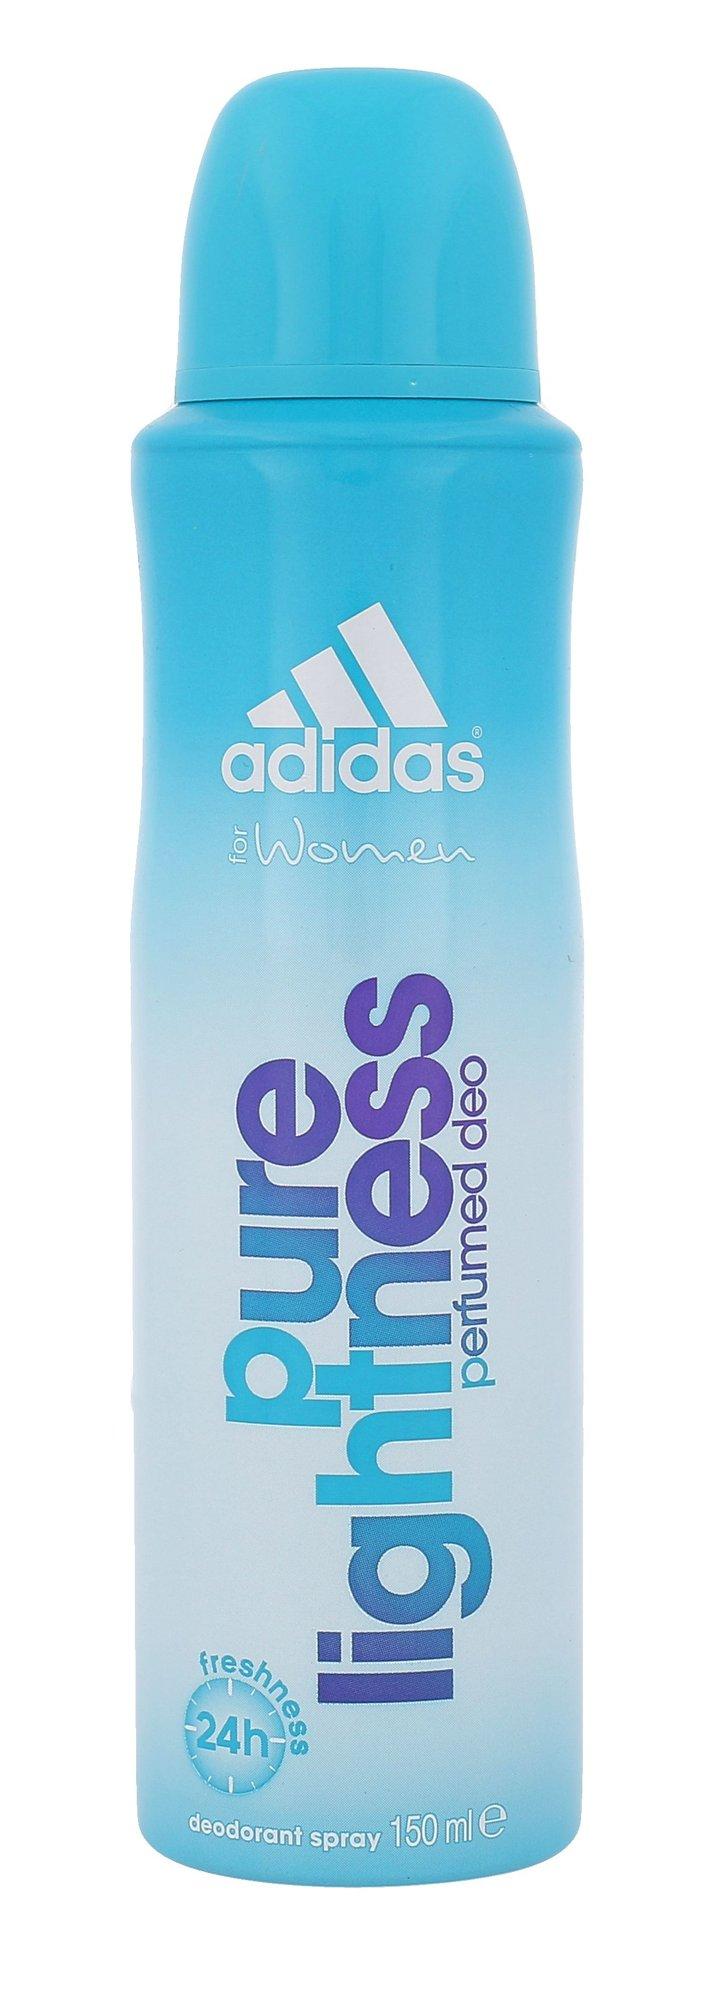 Adidas Pure Lightness For Women Deodorant 150ml